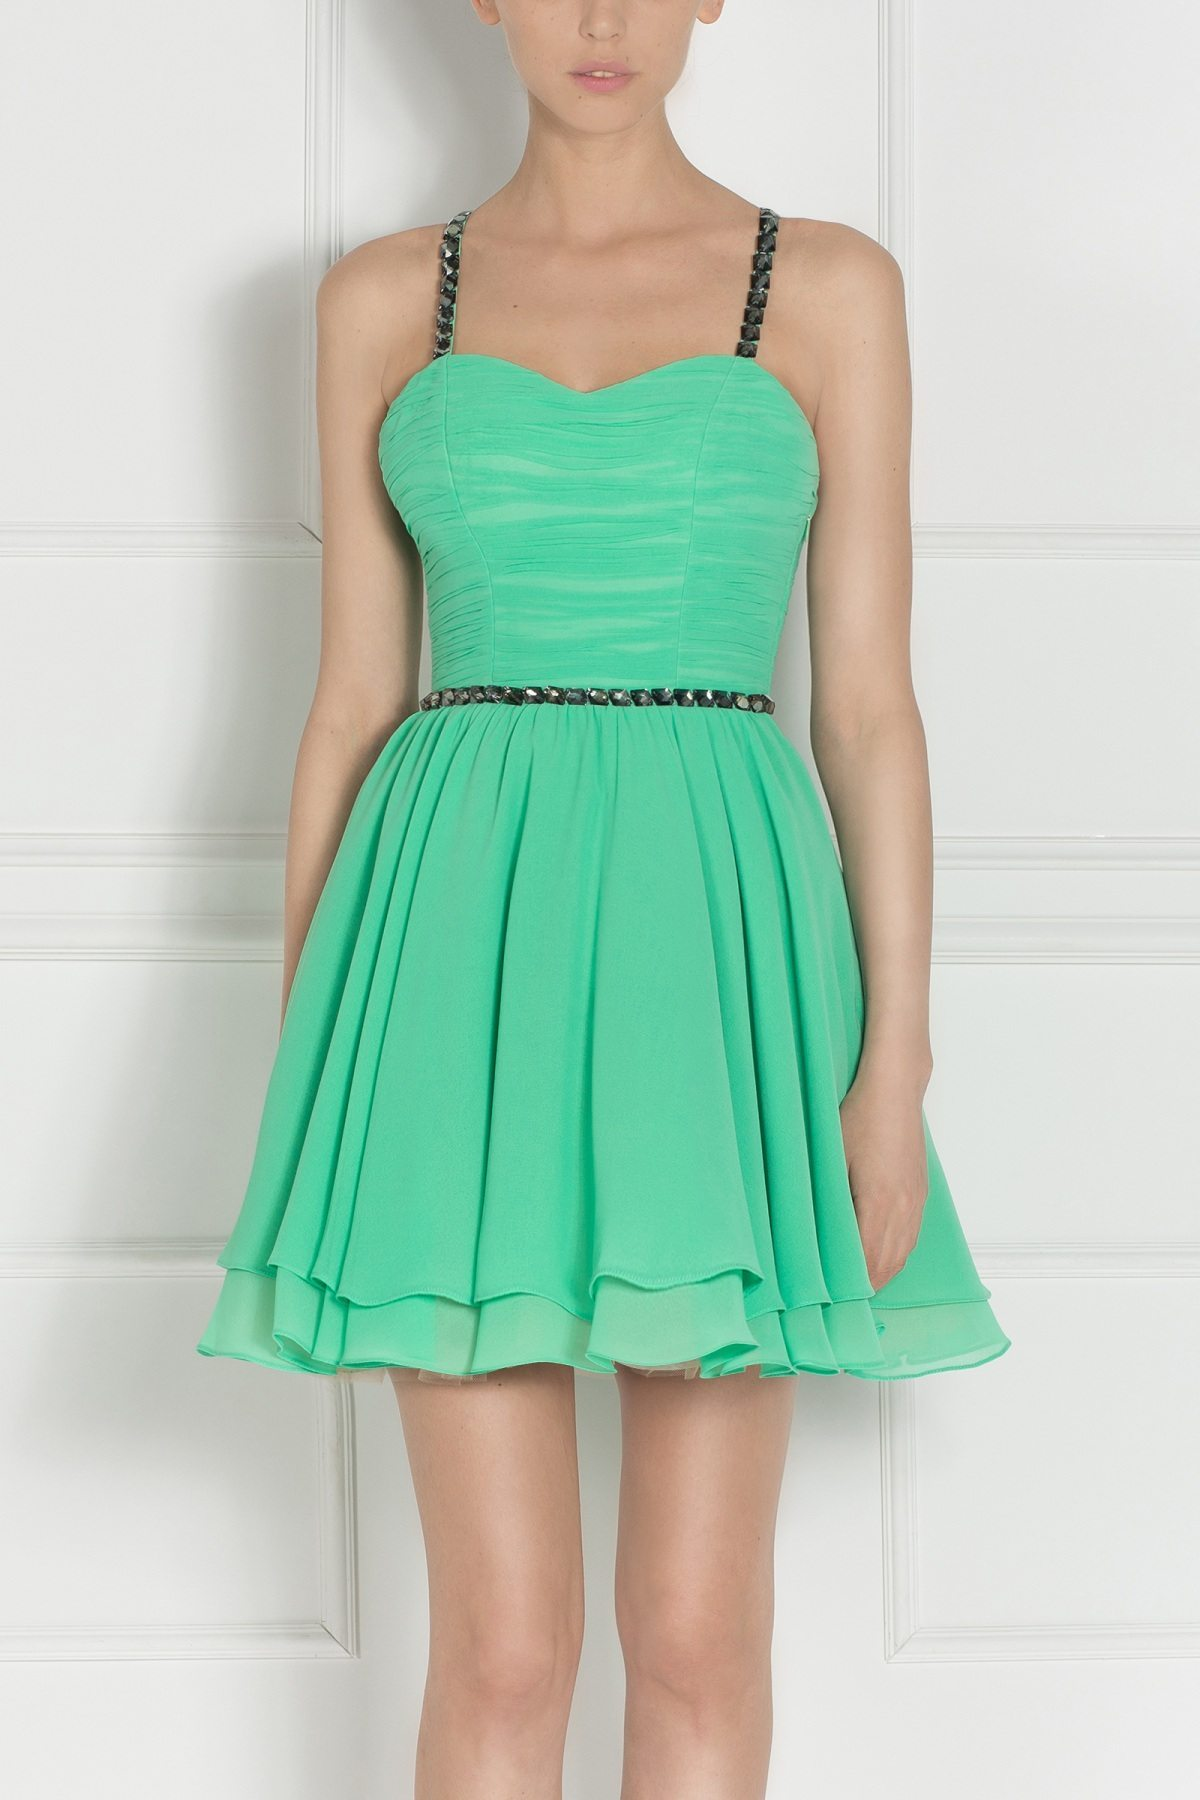 Rochie mini verde cu cristale aplicate Turcoaz